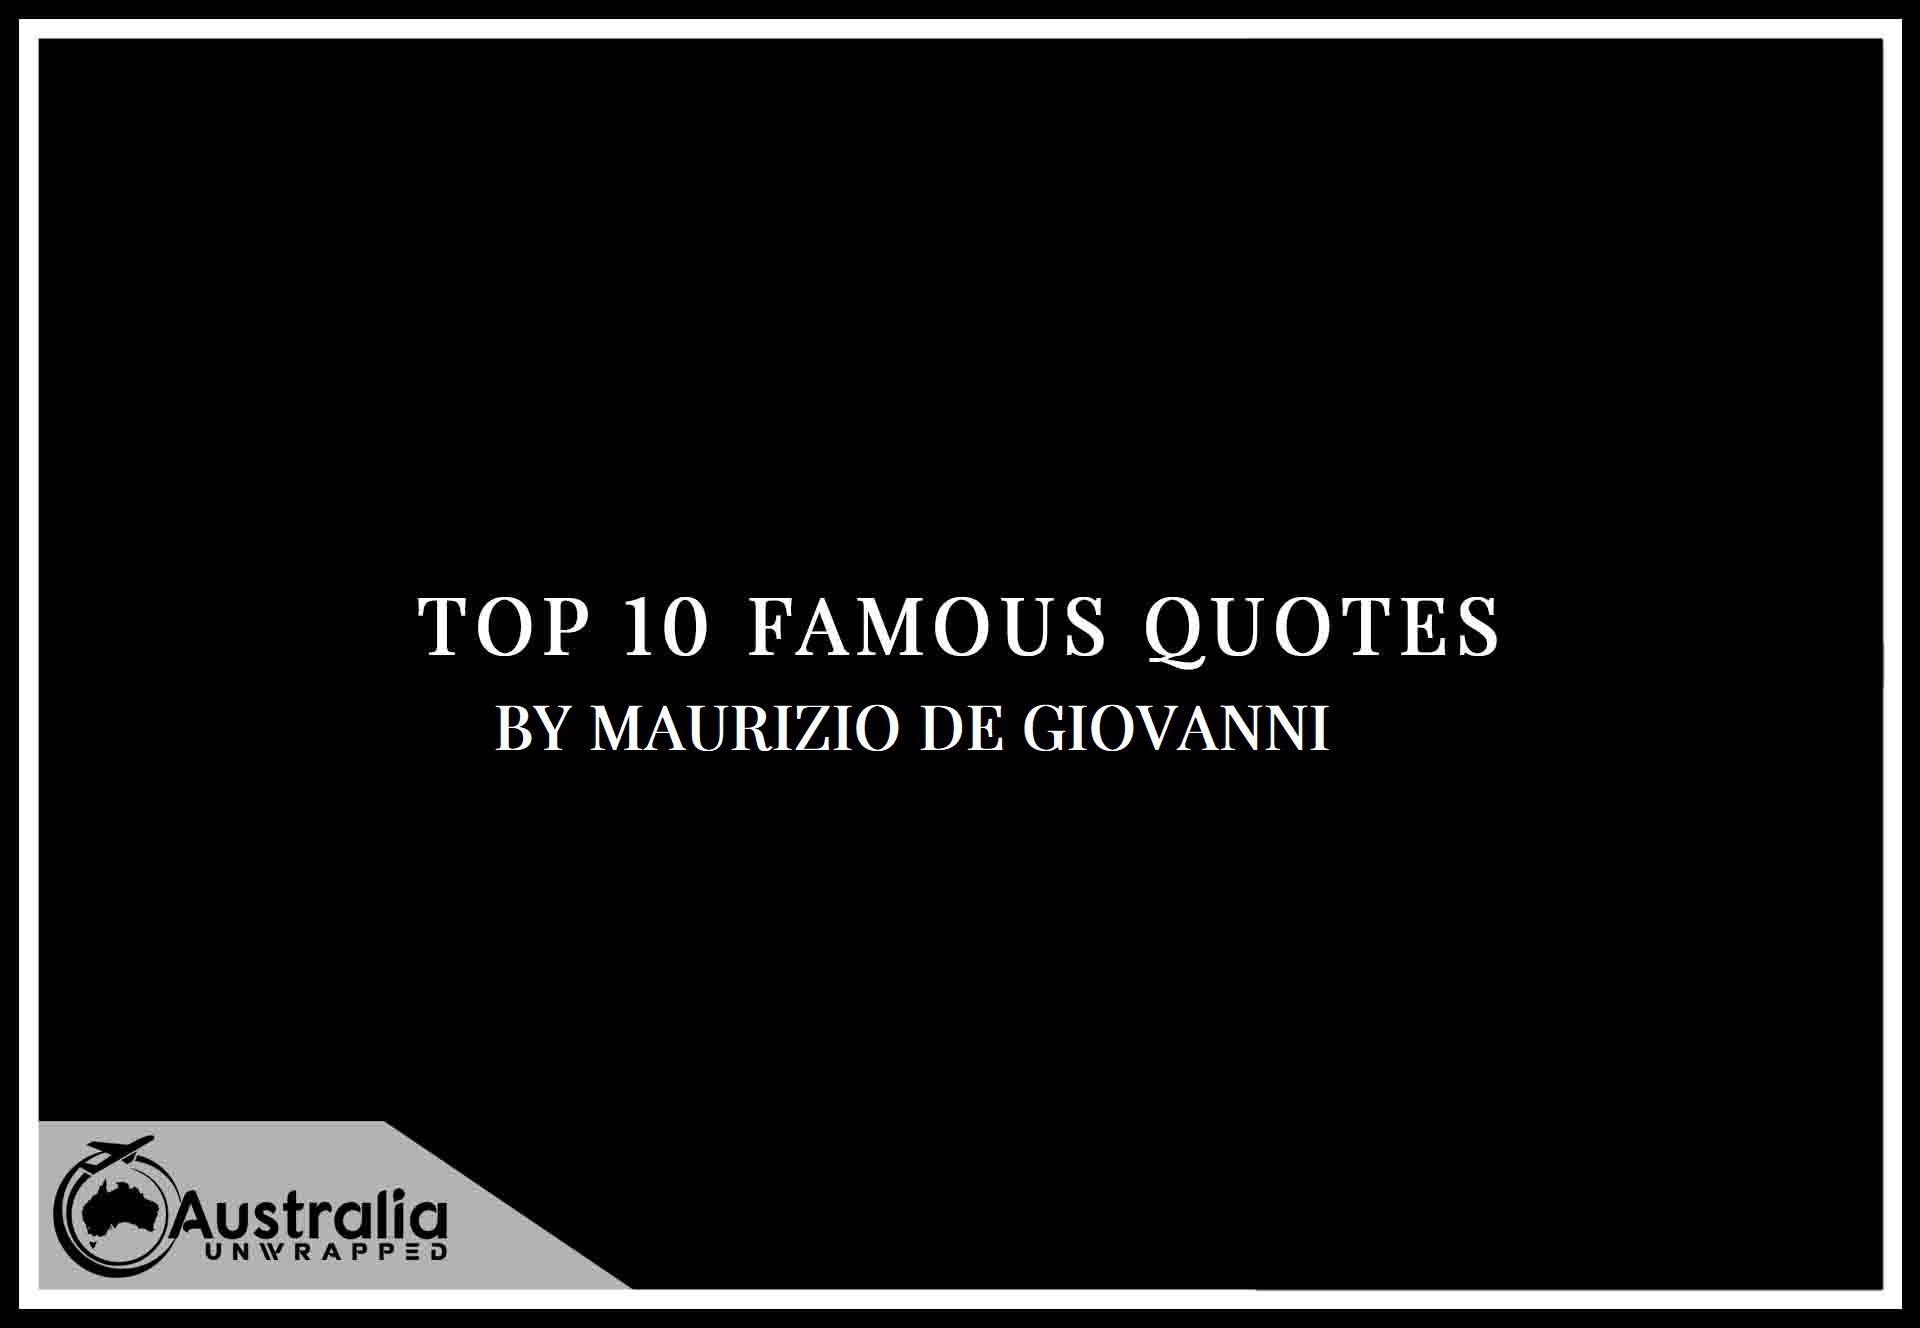 Top 10 Famous Quotes by Author Maurizio de Giovanni